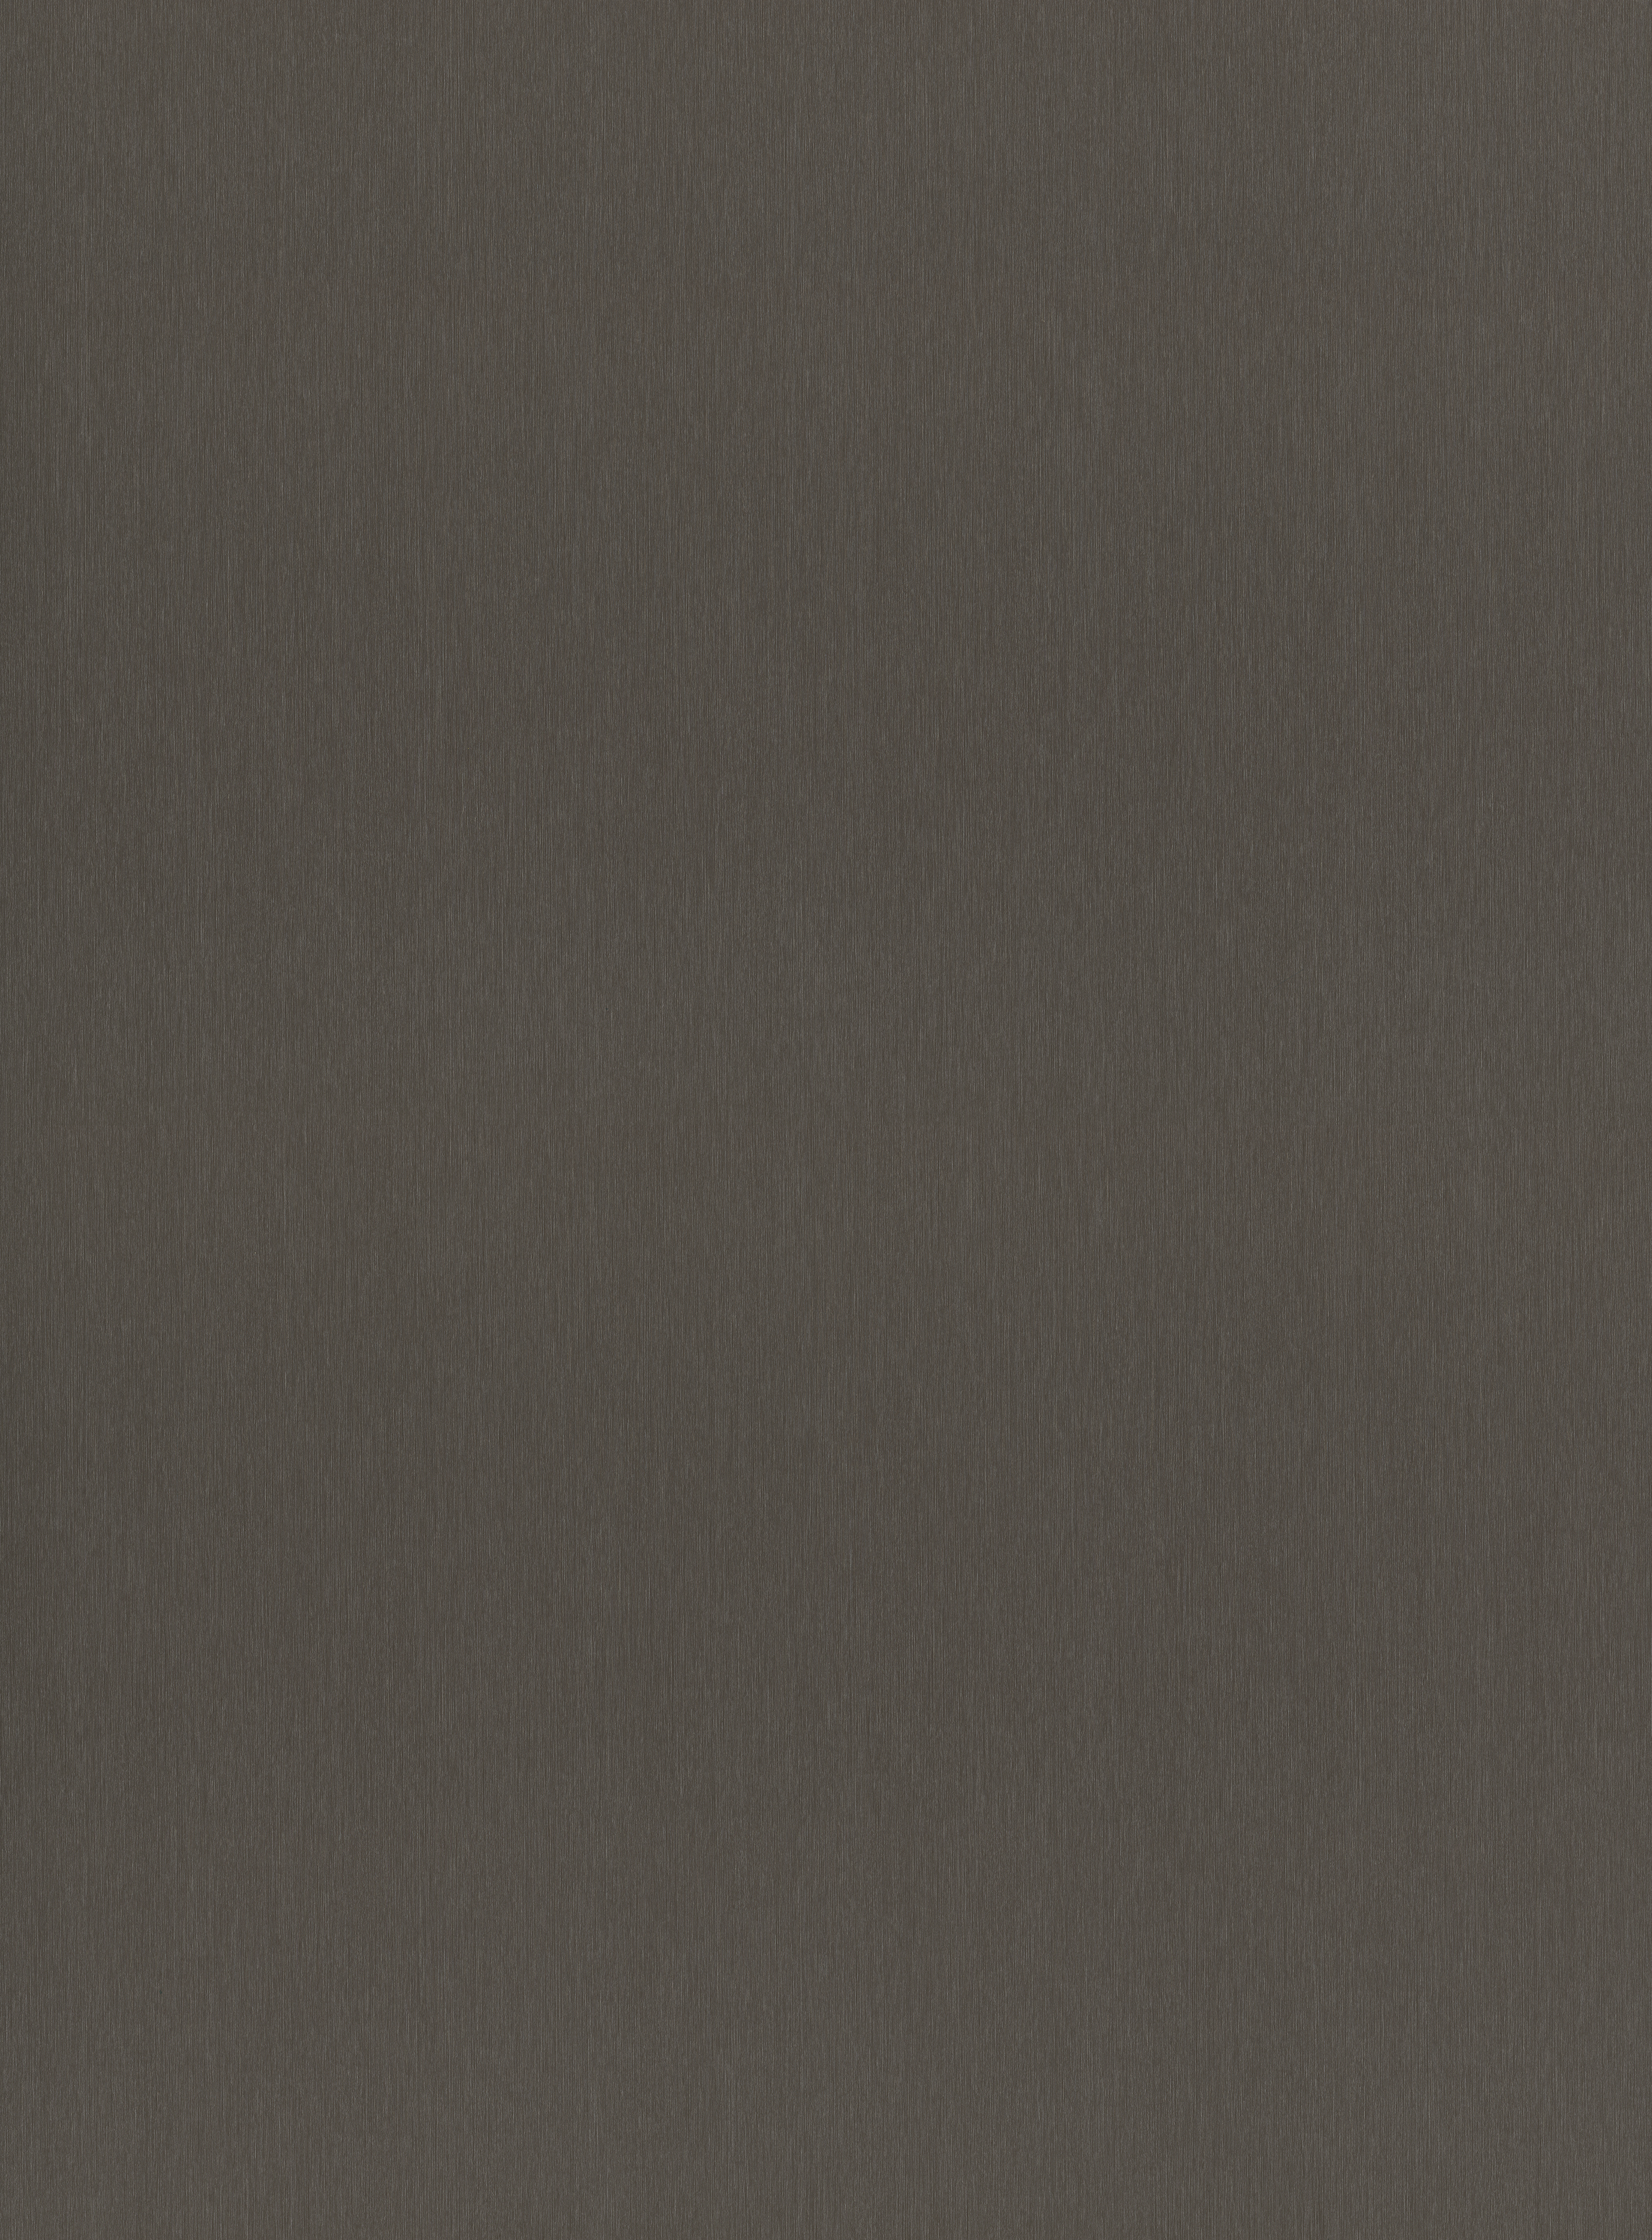 DecoLegno FB65 Reflex, hele plaat afb. 2800x2070m/Tekenprogramma